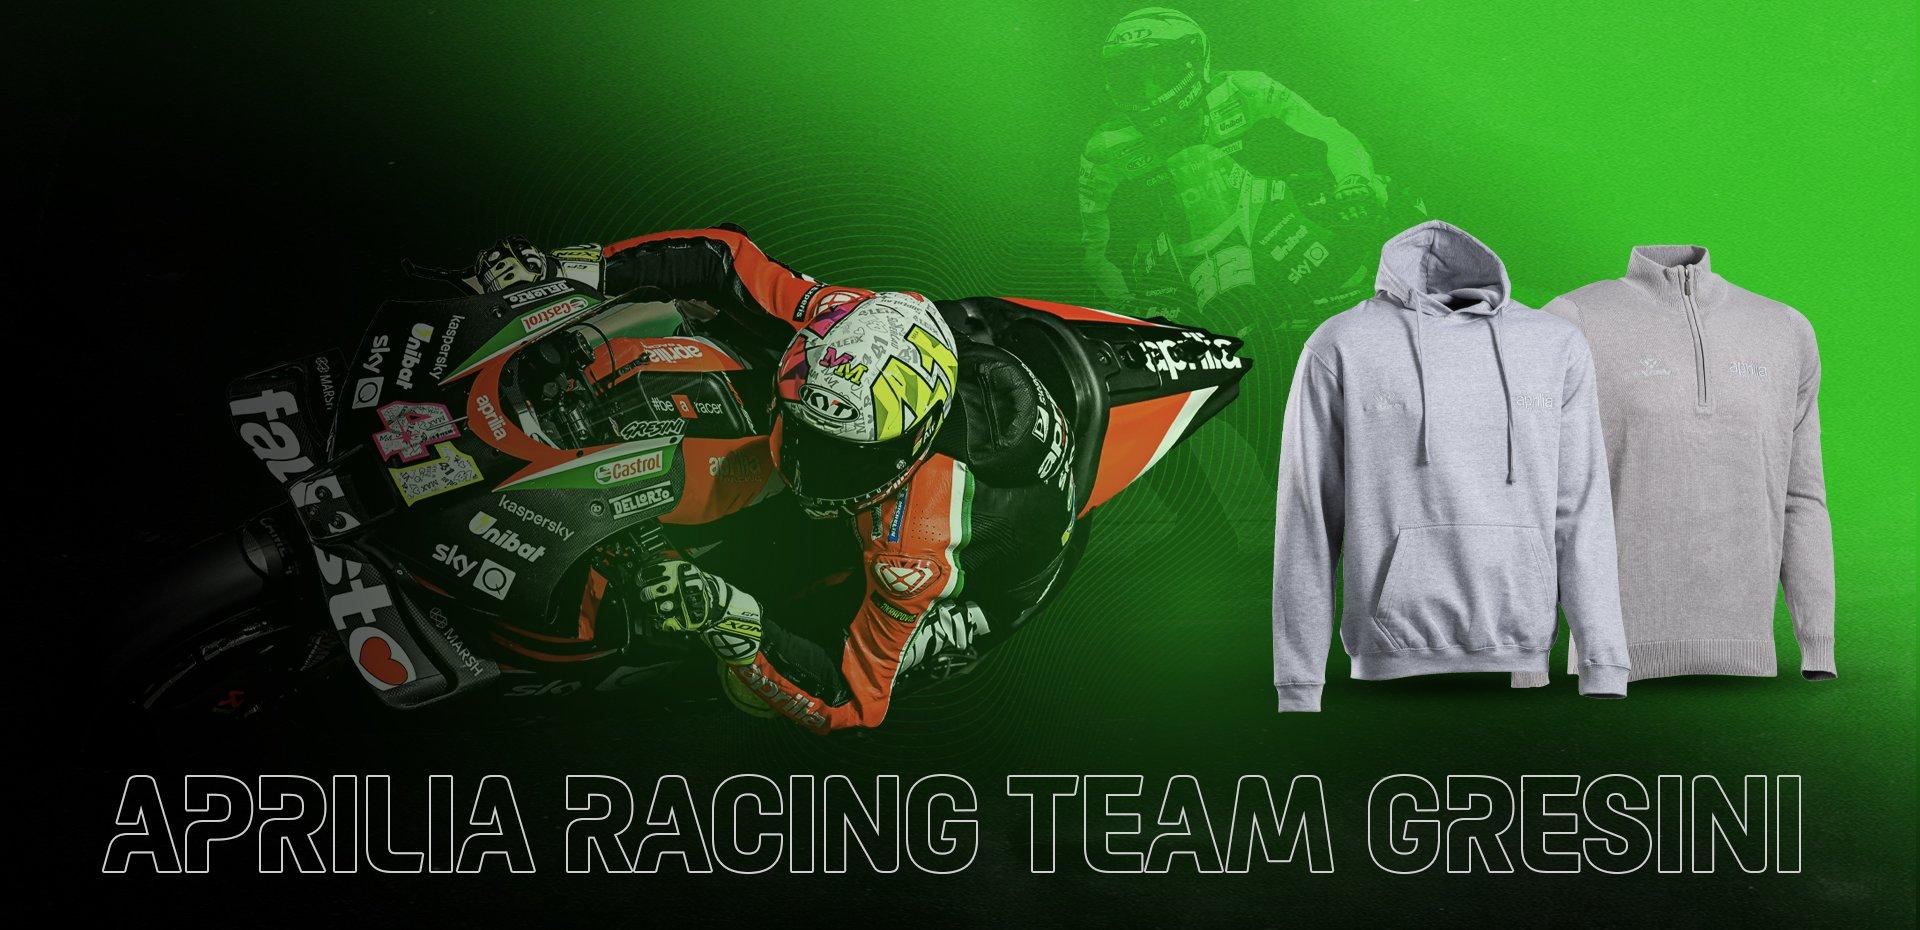 New Aprilia Racing Team Gresini's collection